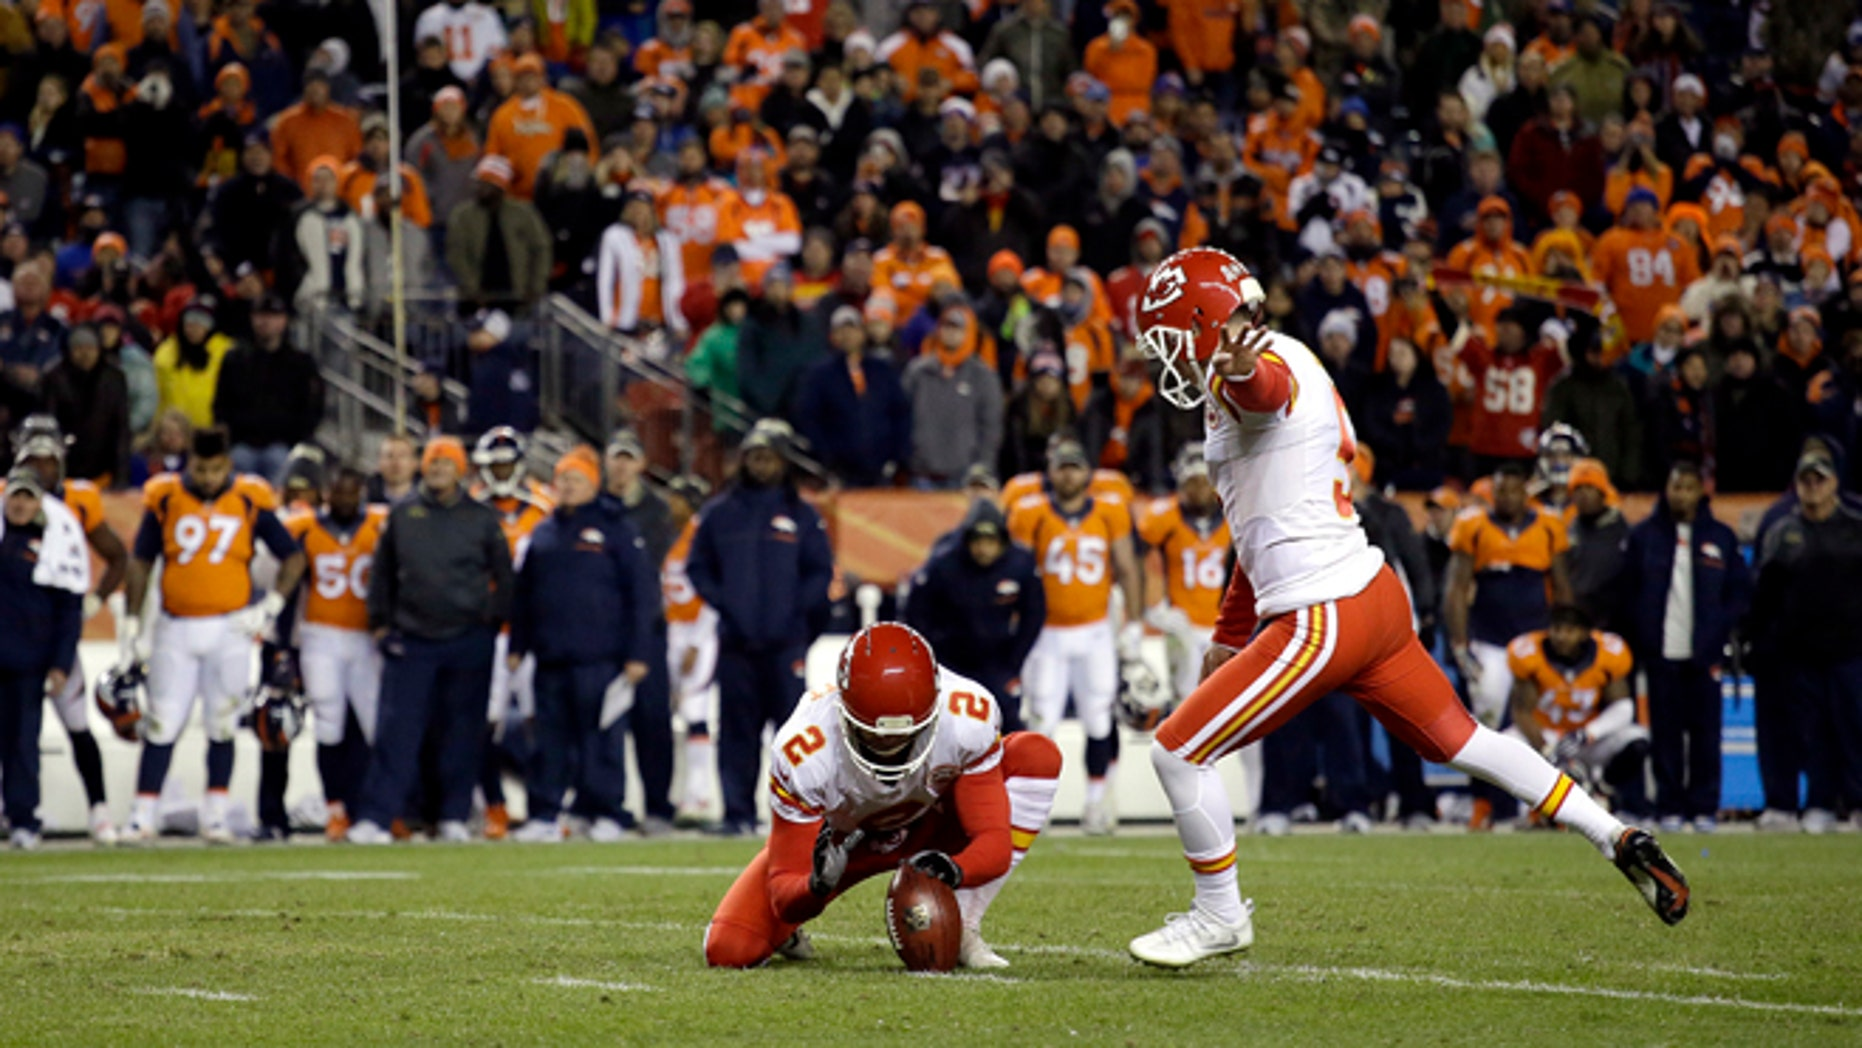 Kansas City Chiefs kicker Cairo Santos (5) kicks the game winning field goal as punter Dustin Colquitt (2) holds during overtime of an NFL football game against the Denver Broncos, Sunday, Nov. 27, 2016, in Denver. The Chiefs won 30-27 in overtime. (AP Photo/Joe Mahoney)